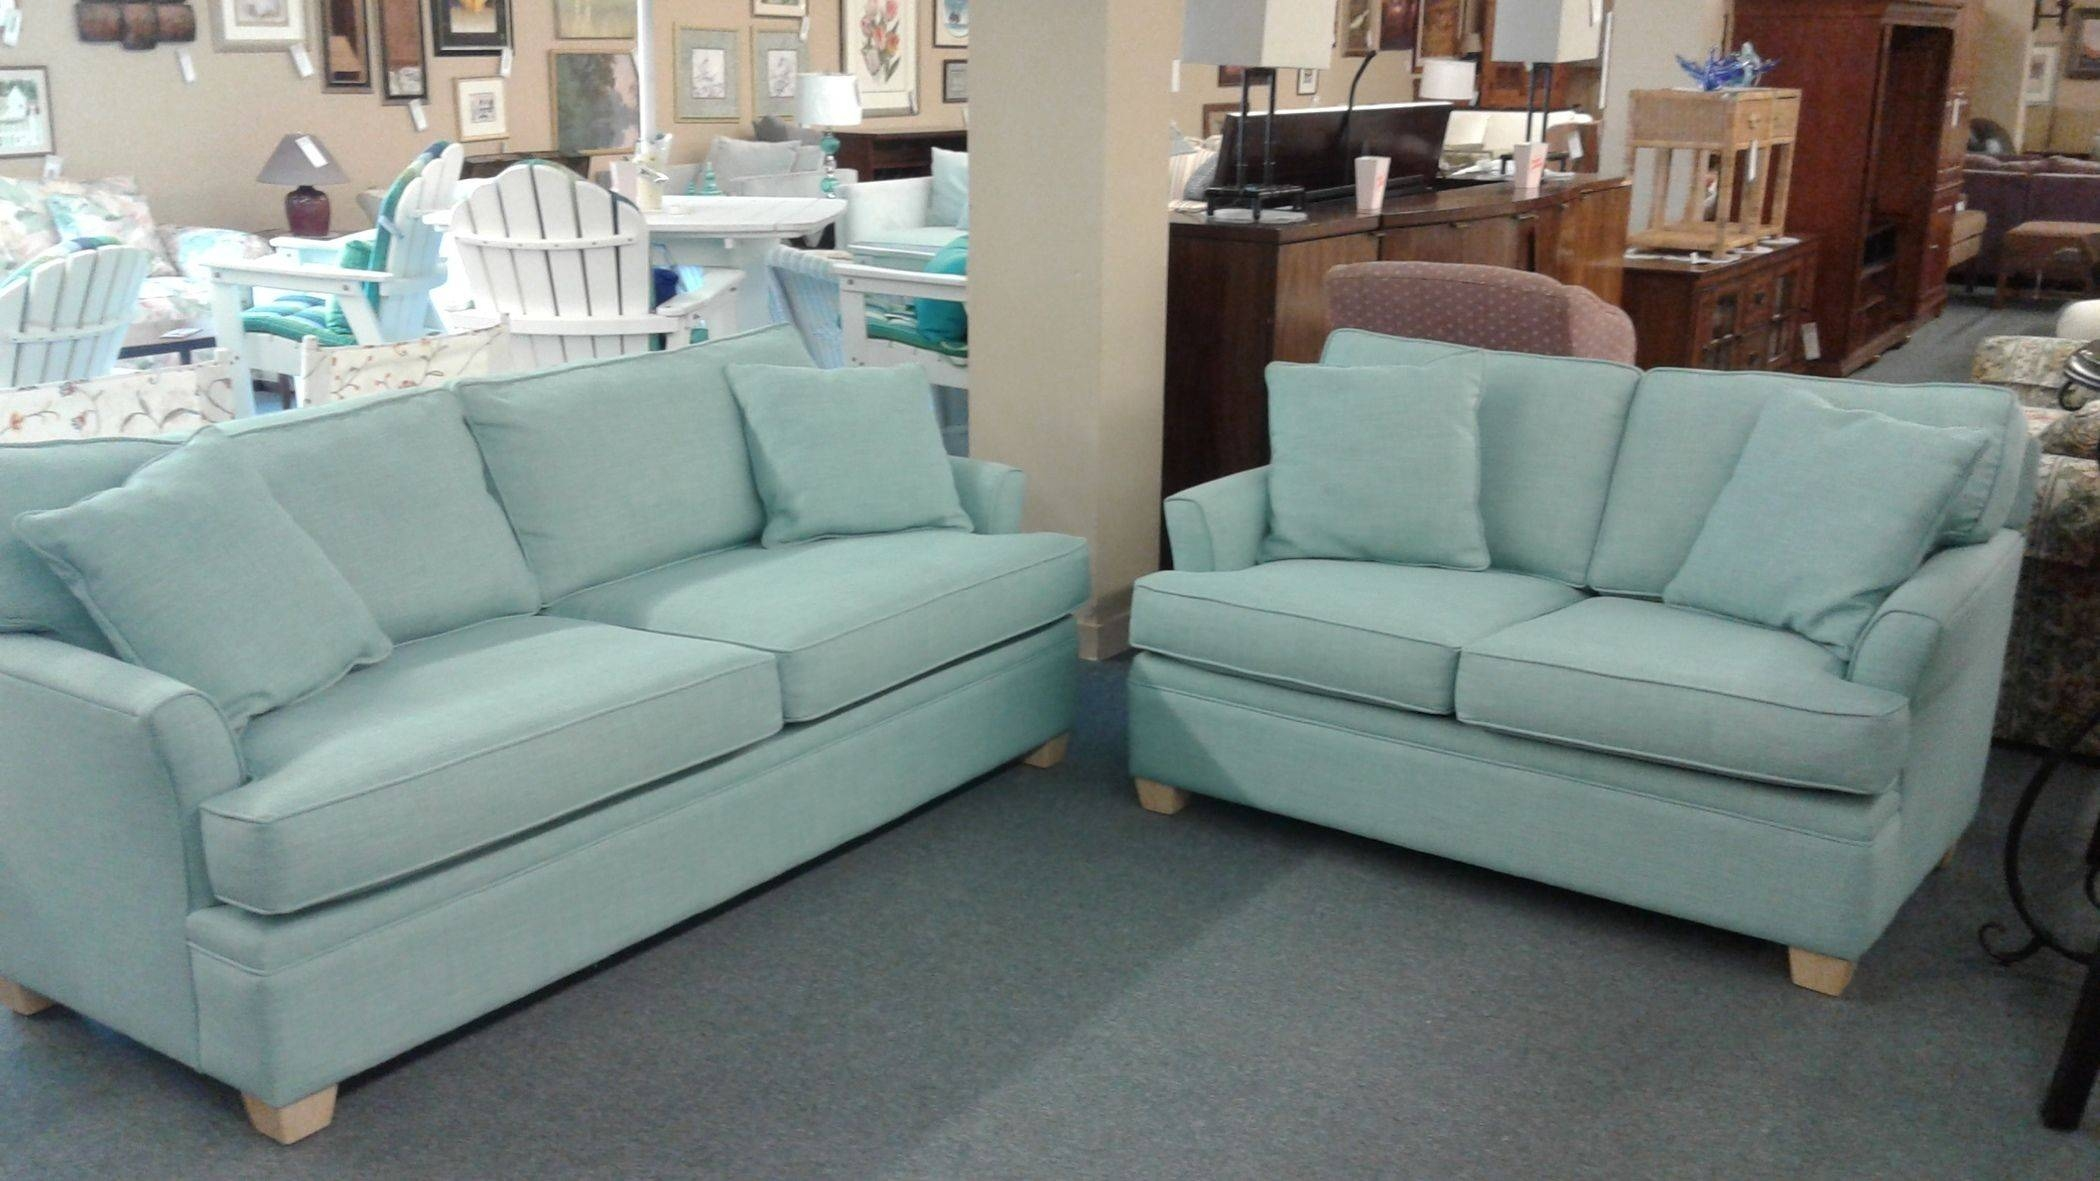 Braxton Culler Sofa & Loveseat | Delmarva Furniture Consignment pertaining to Braxton Culler Sofas (Image 9 of 15)